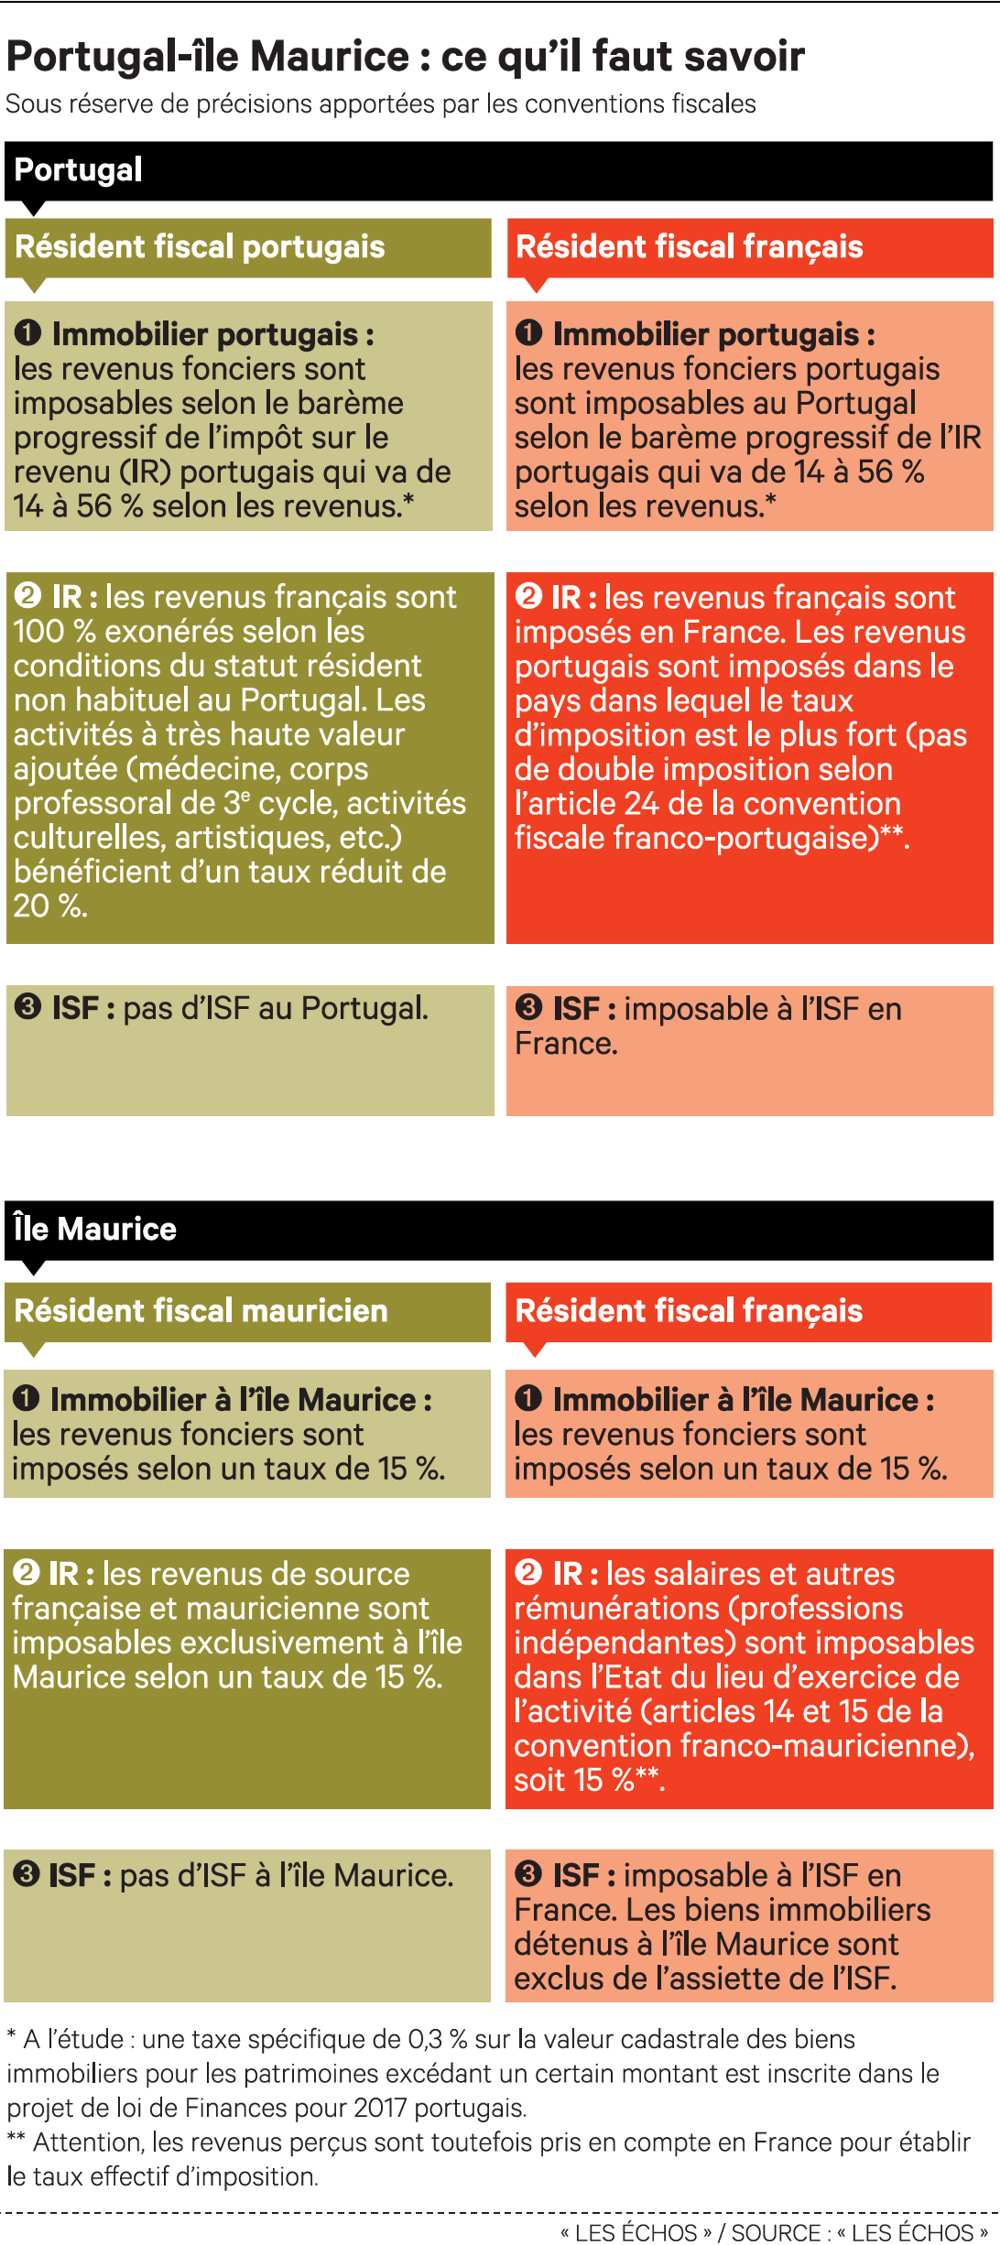 Le match île Maurice-Portugal